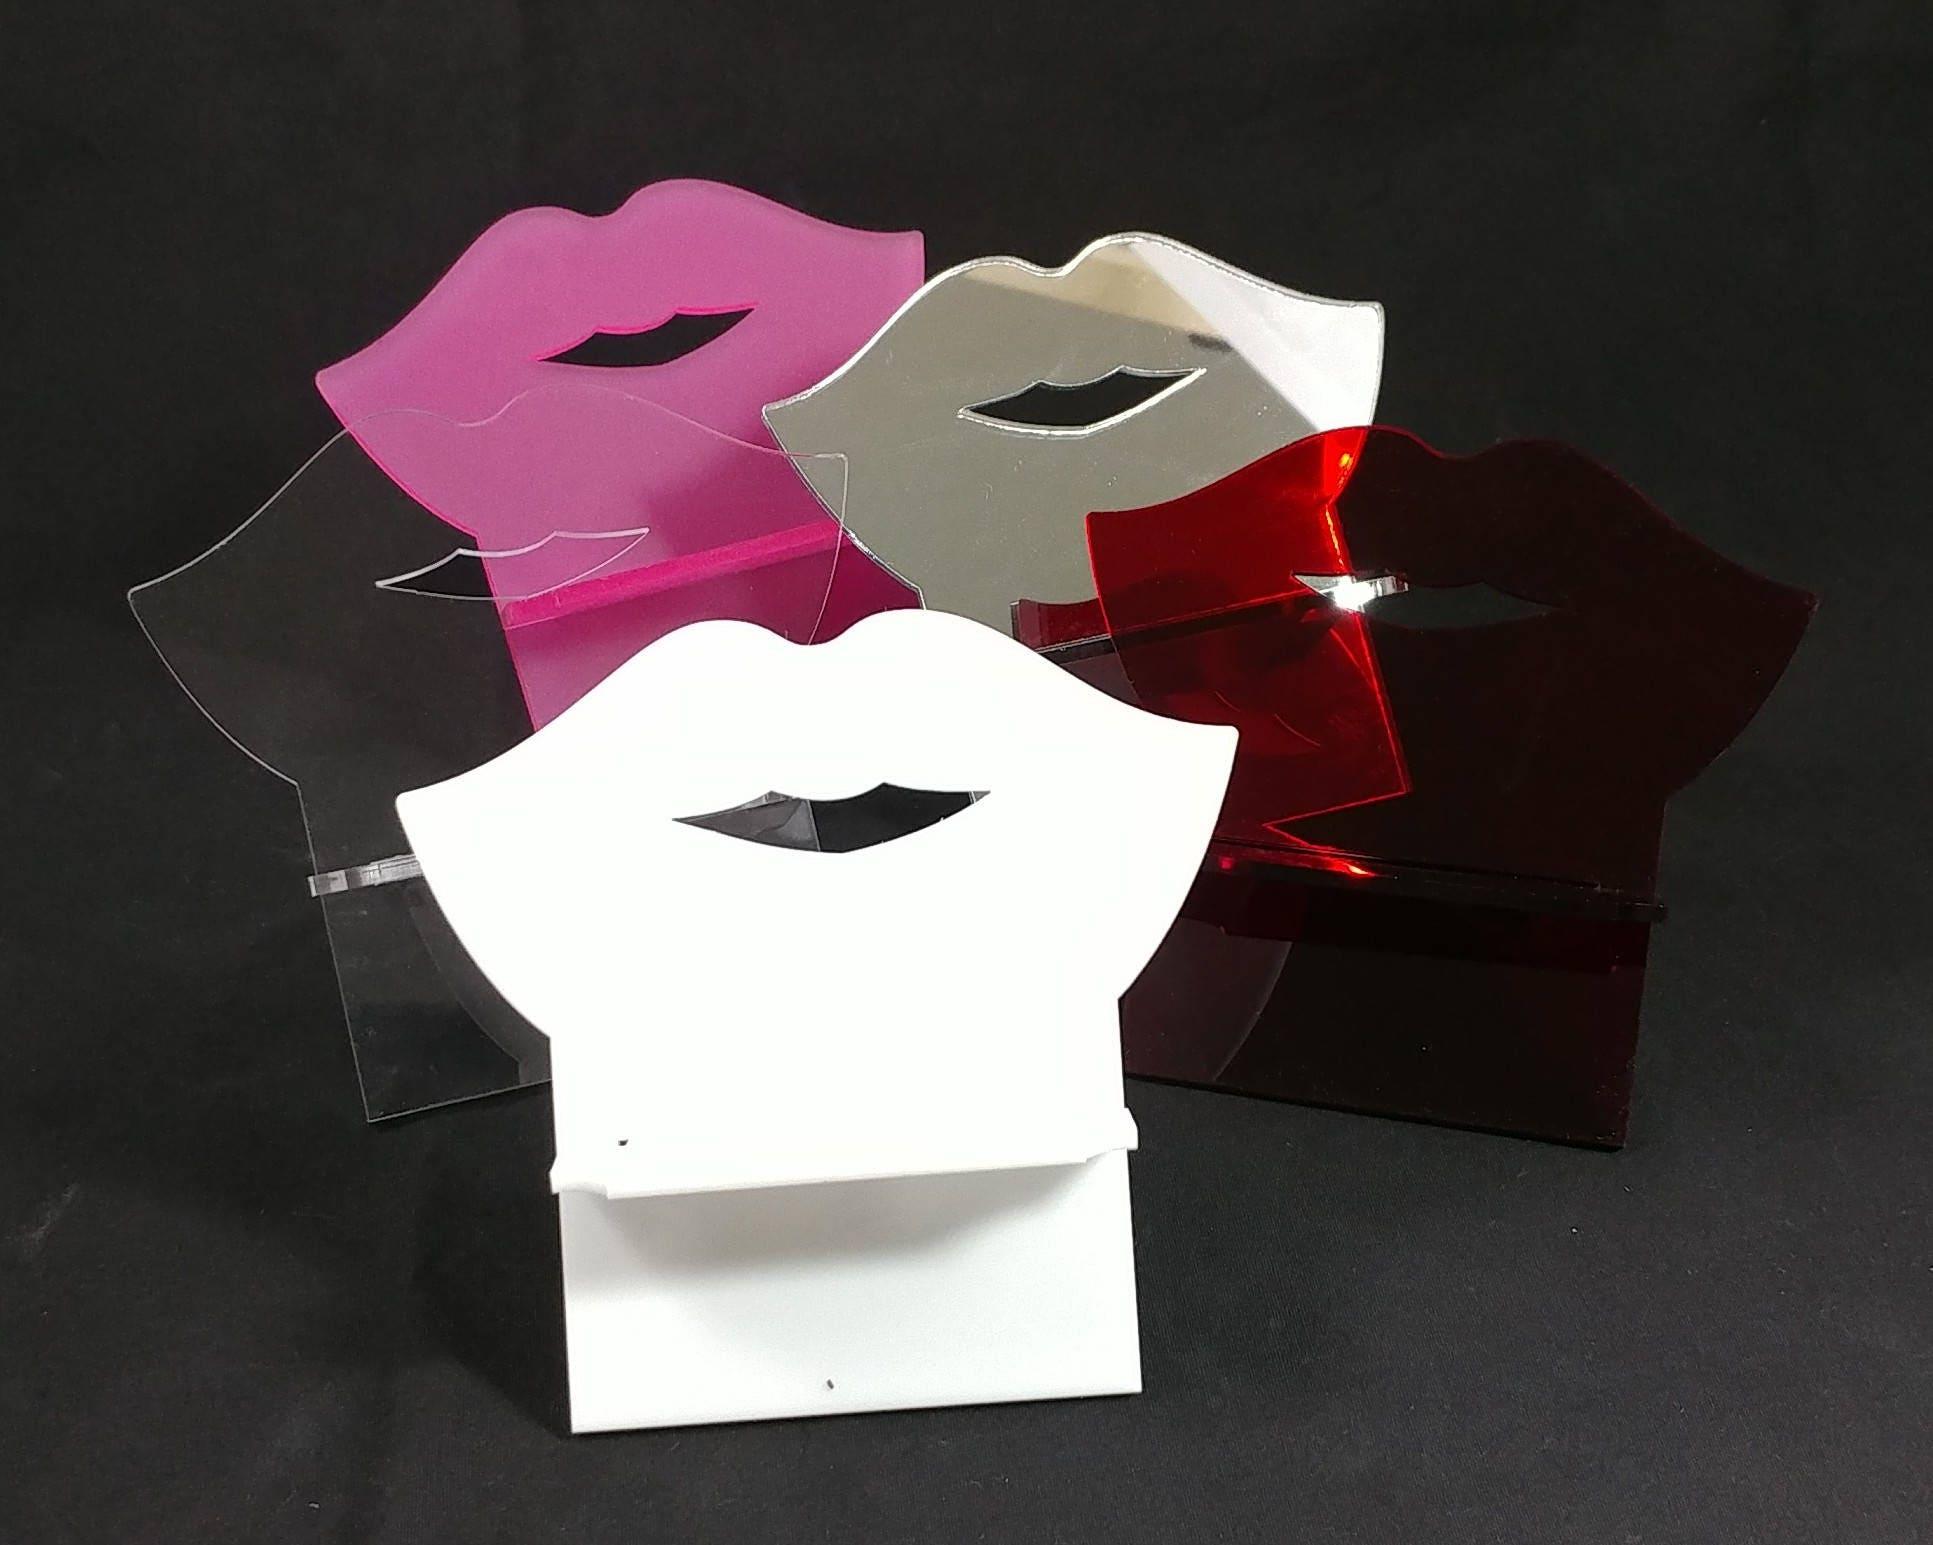 LipSense Business card holder LipSense lipstick business